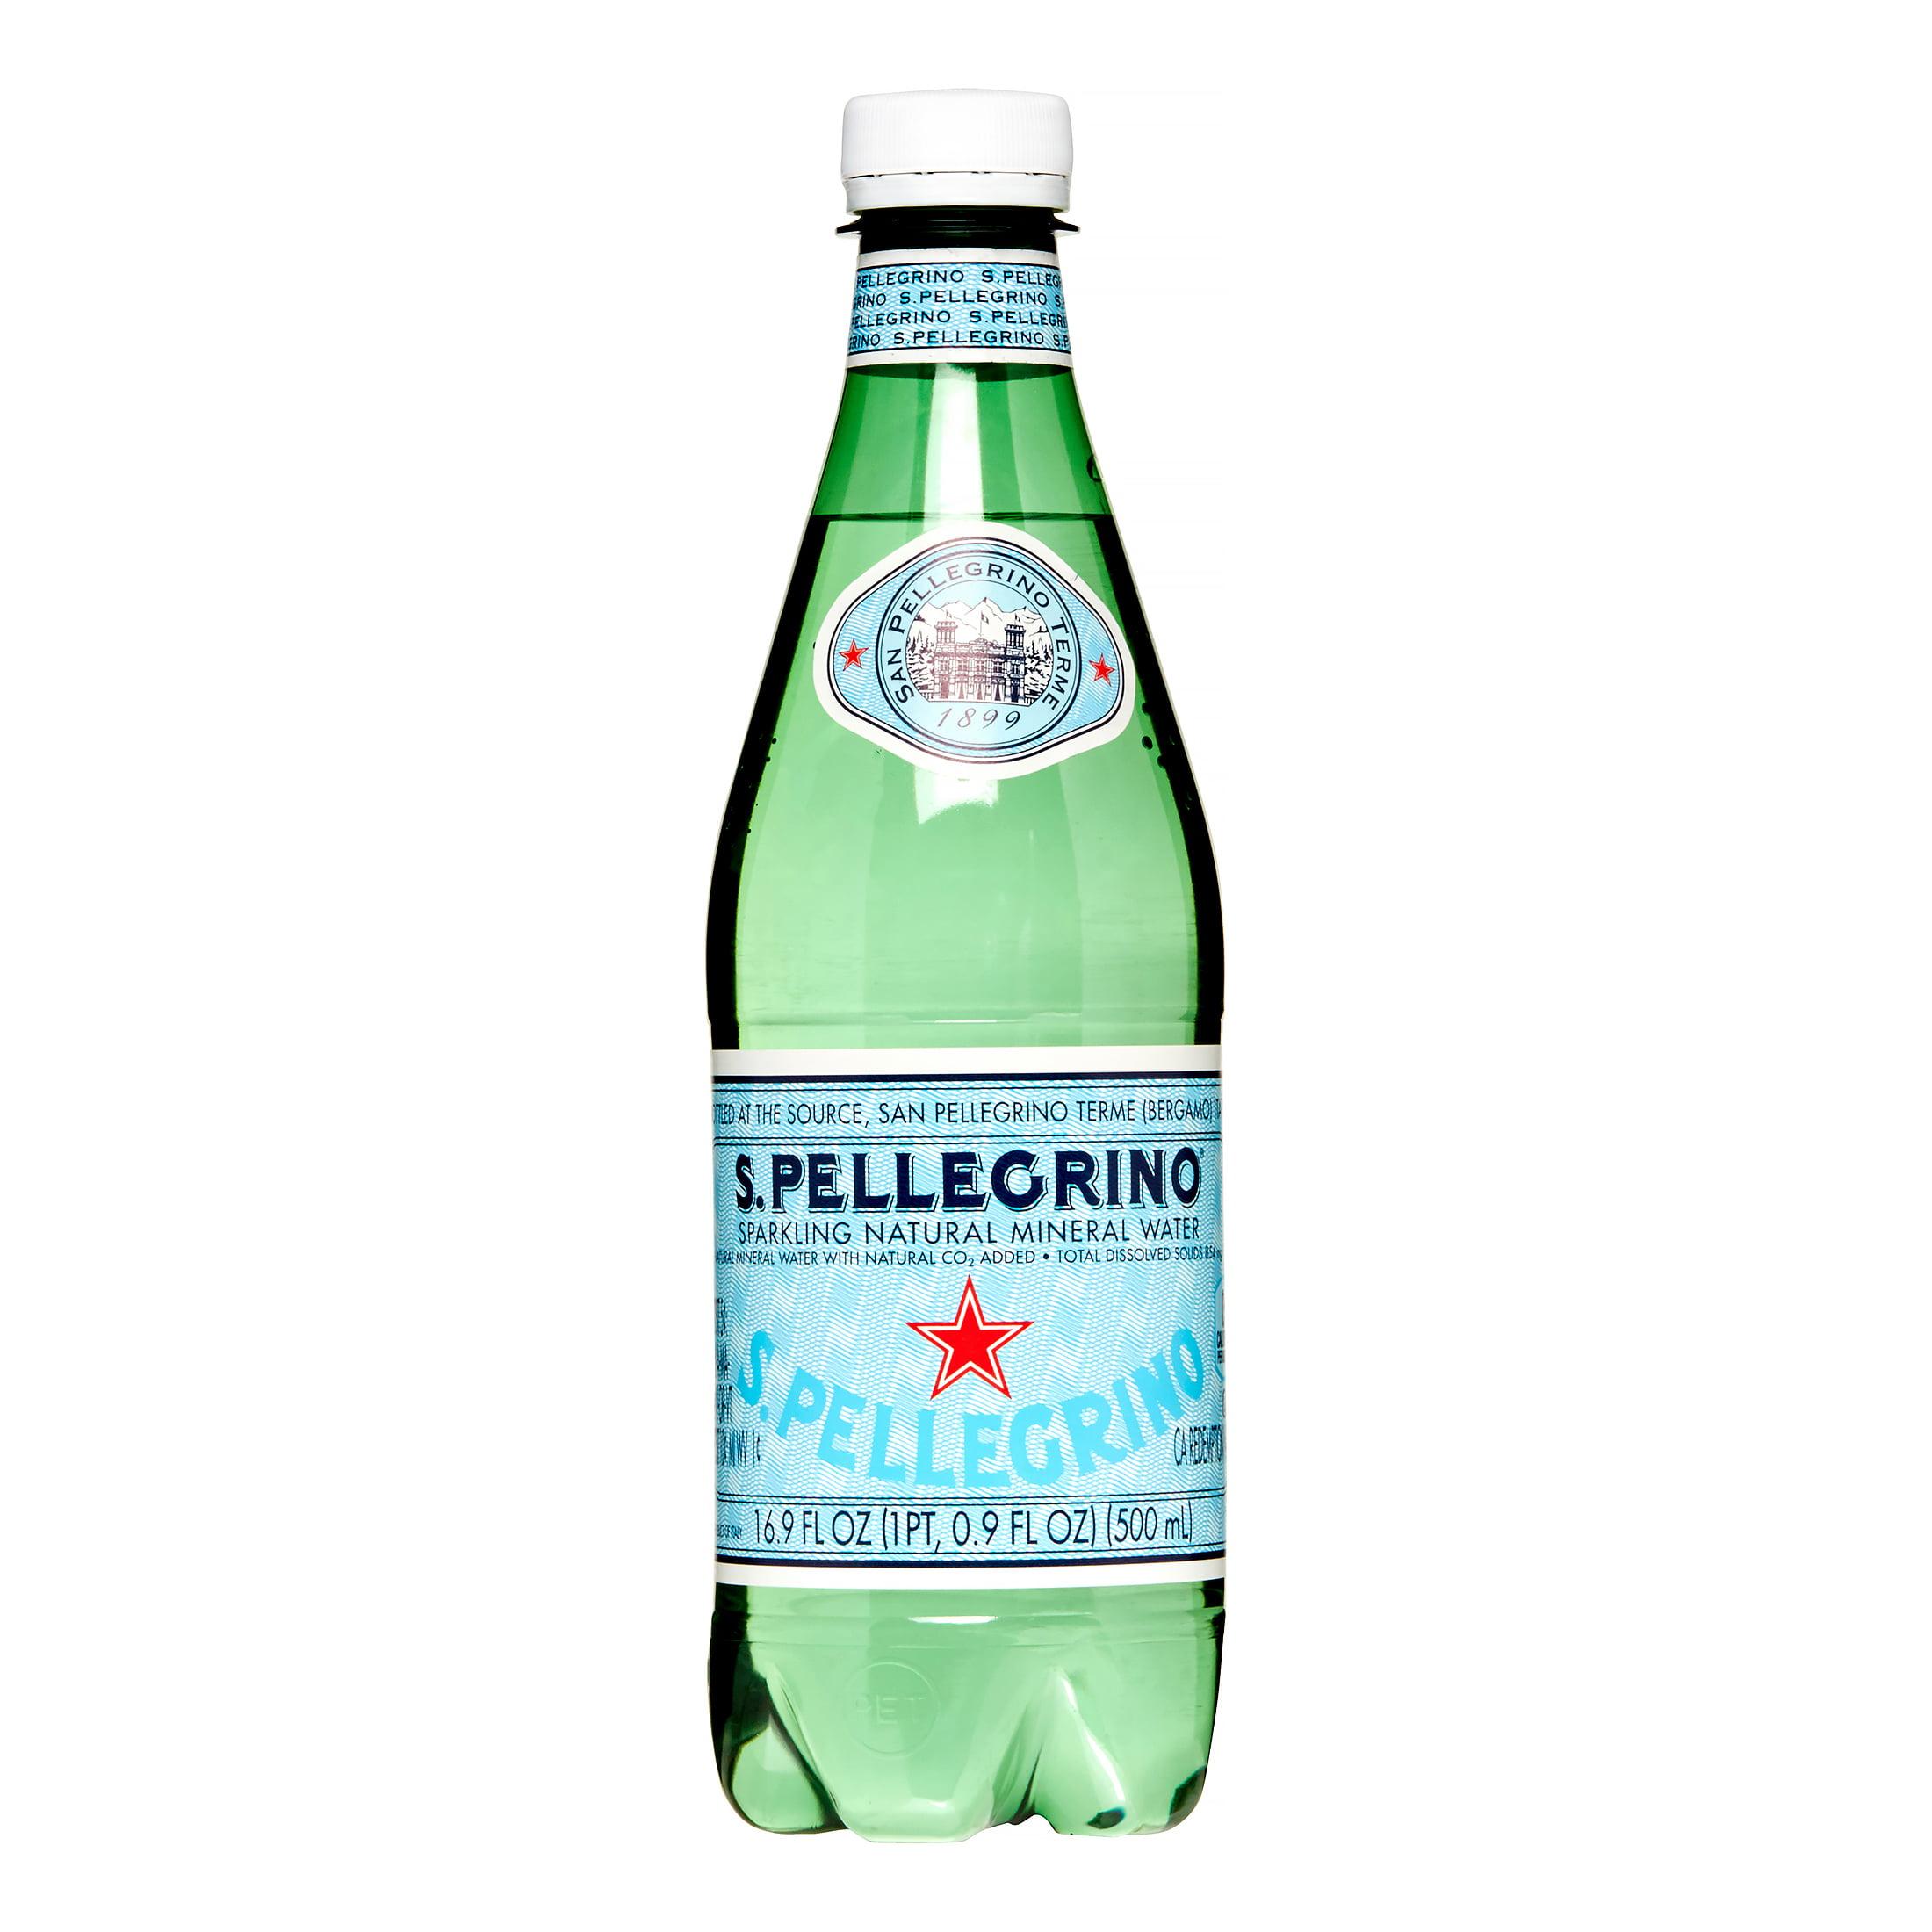 S Pellegrino Sparkling Natural Mineral Water Bottles Ml